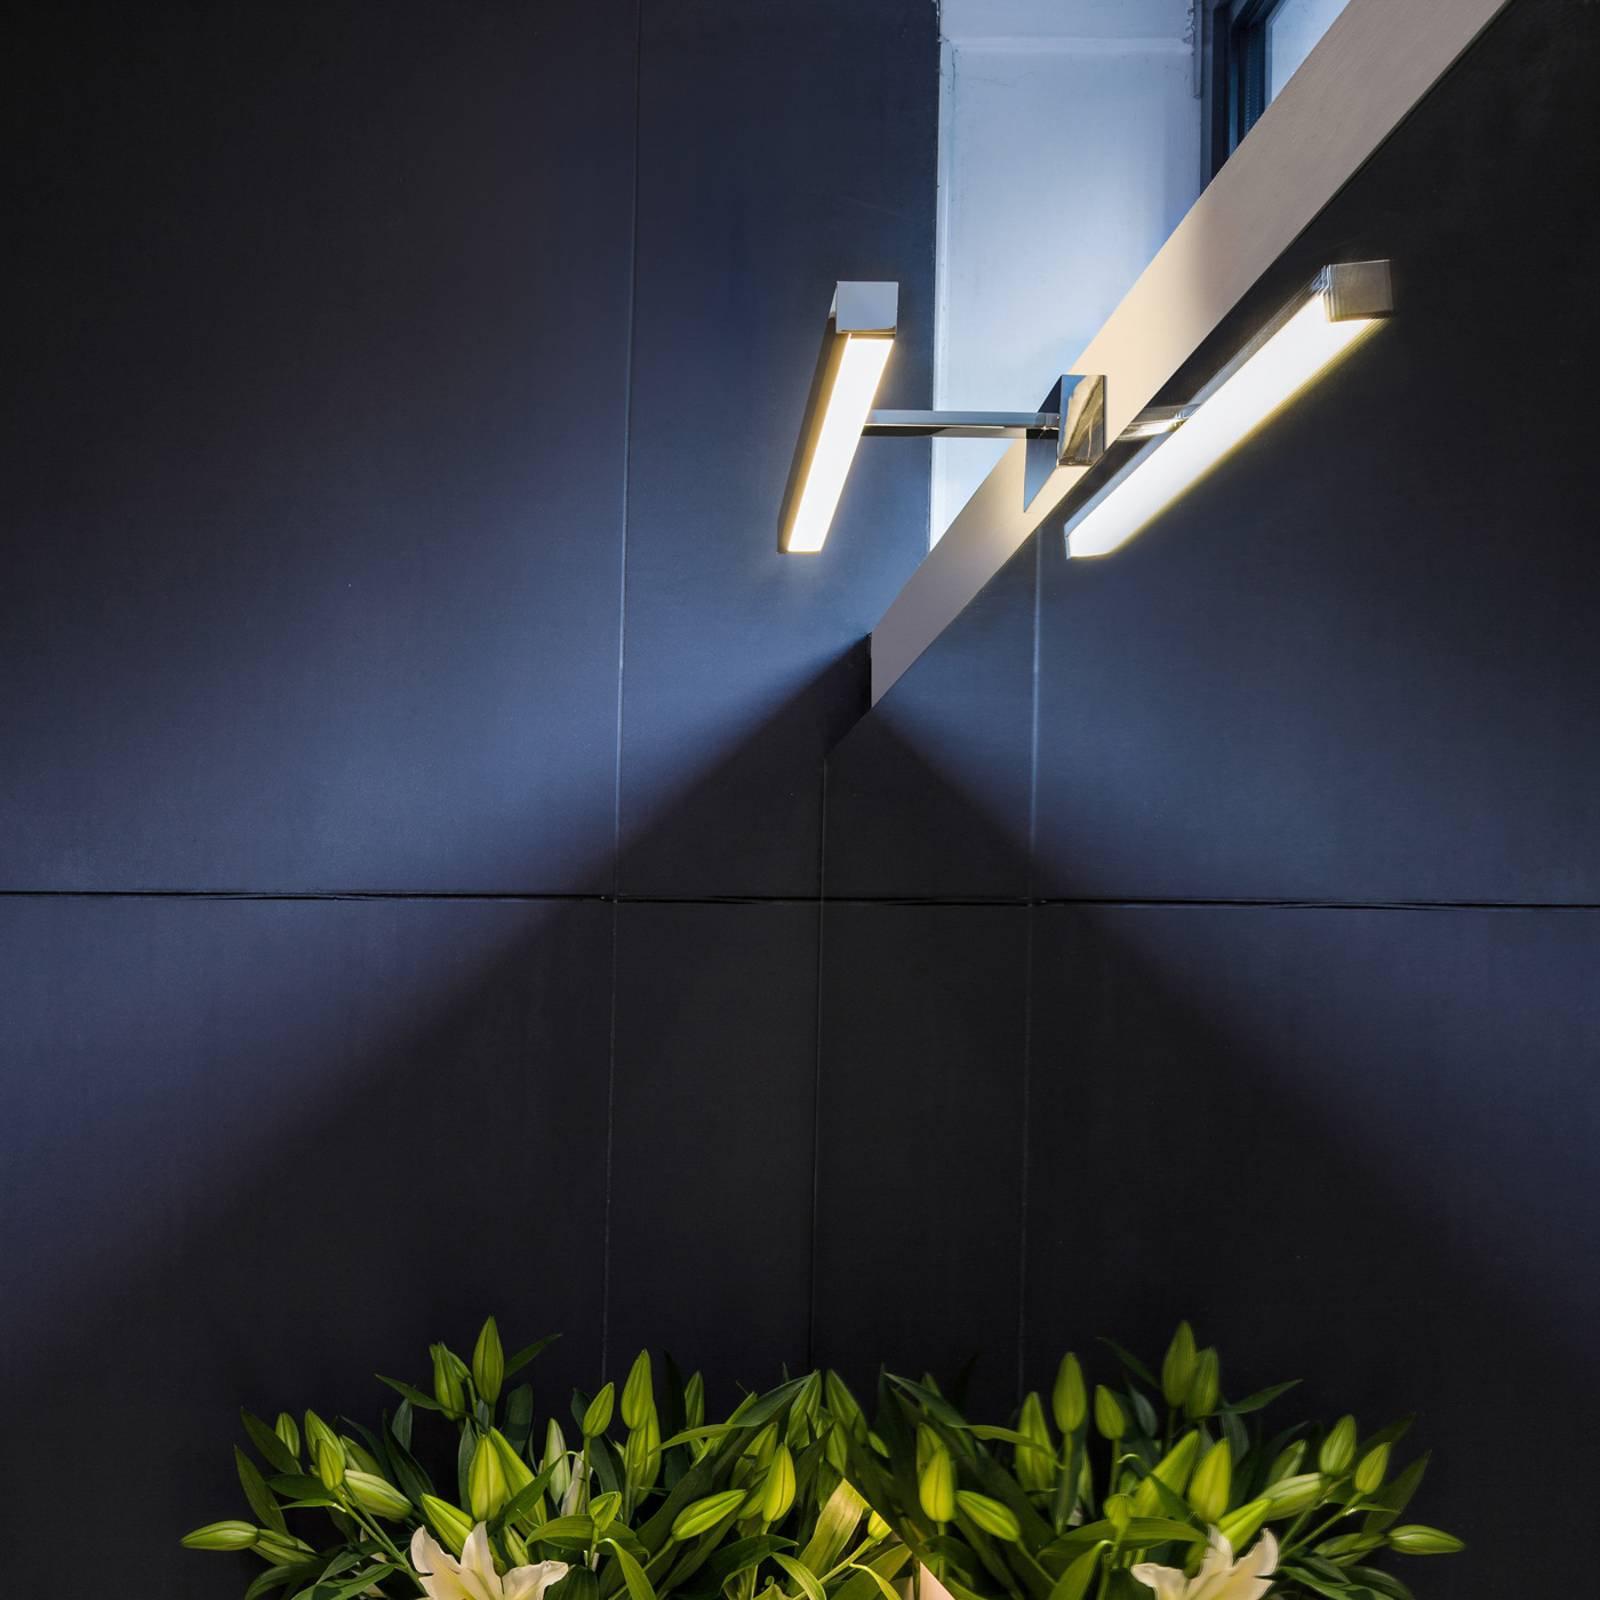 Astro Kashima 350 LED-speillampe, krom, 35 cm